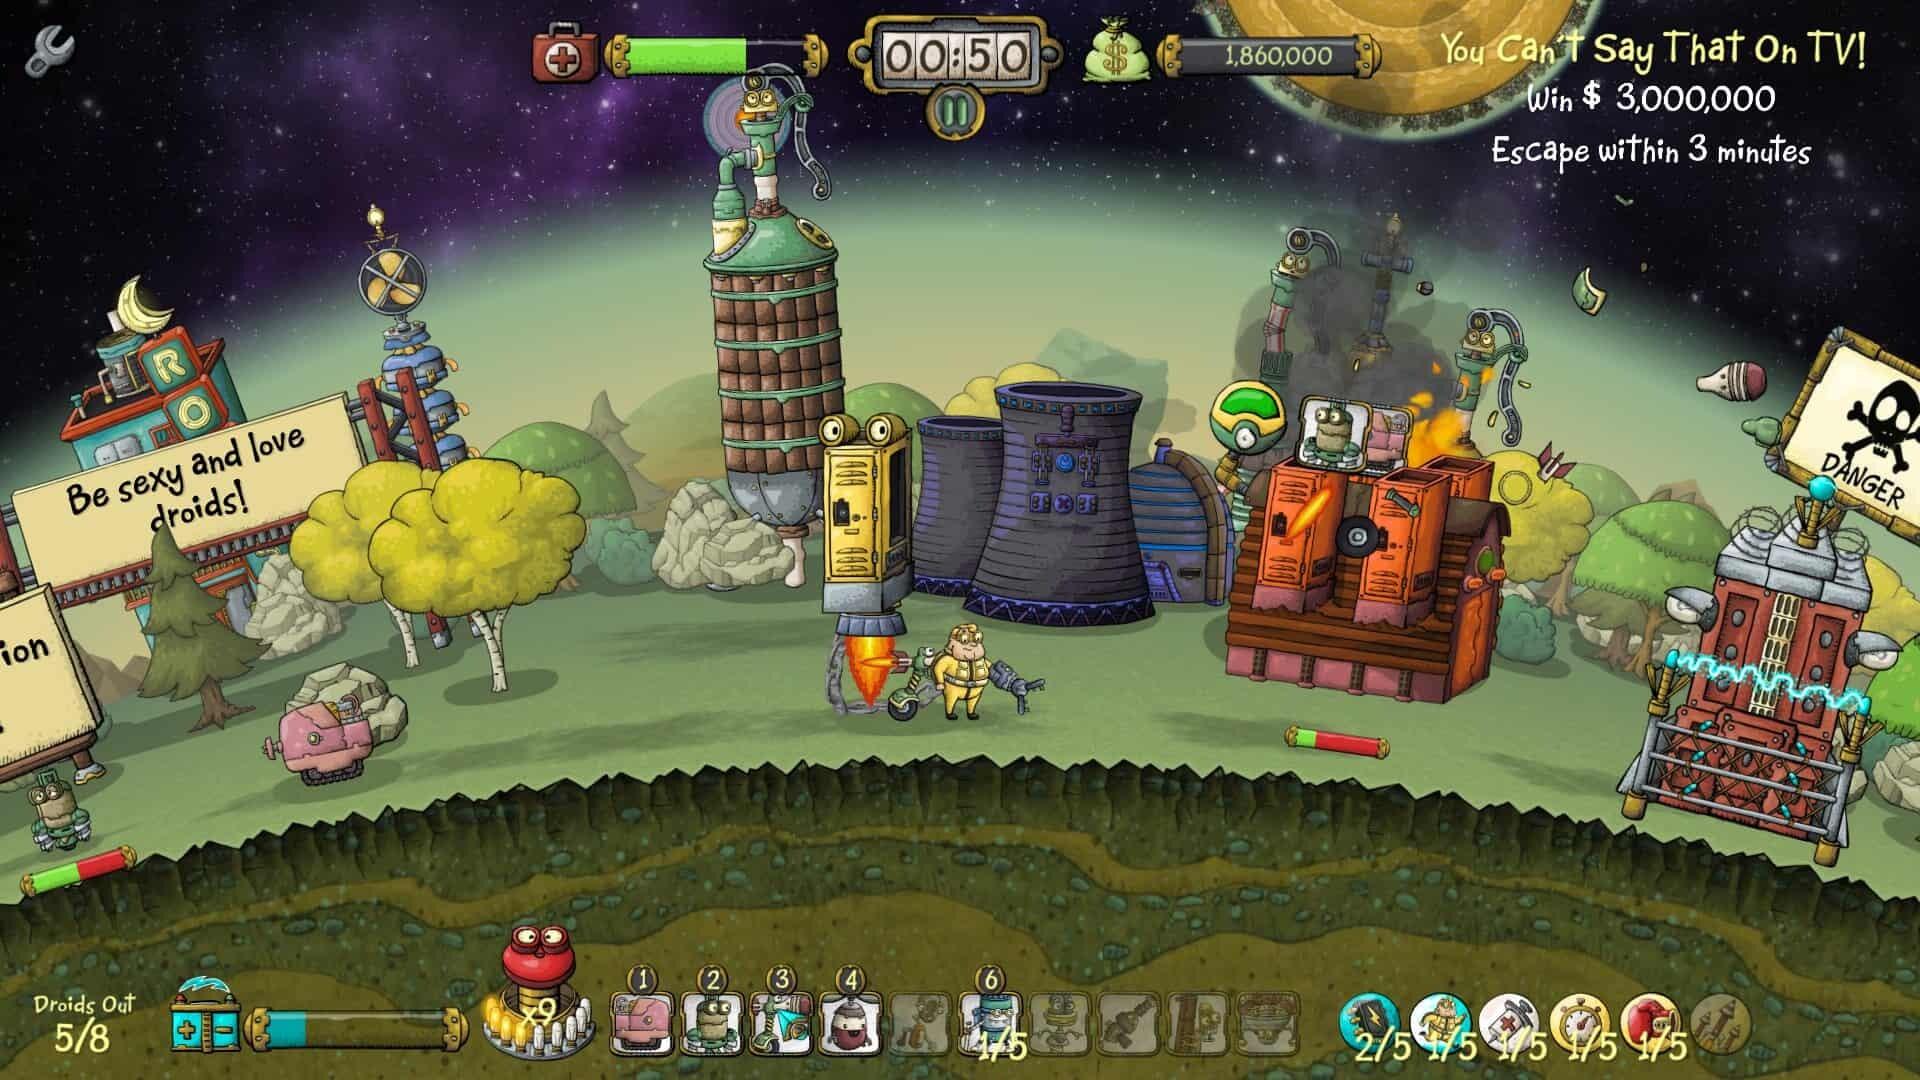 Death by Gameshow game screenshot 4